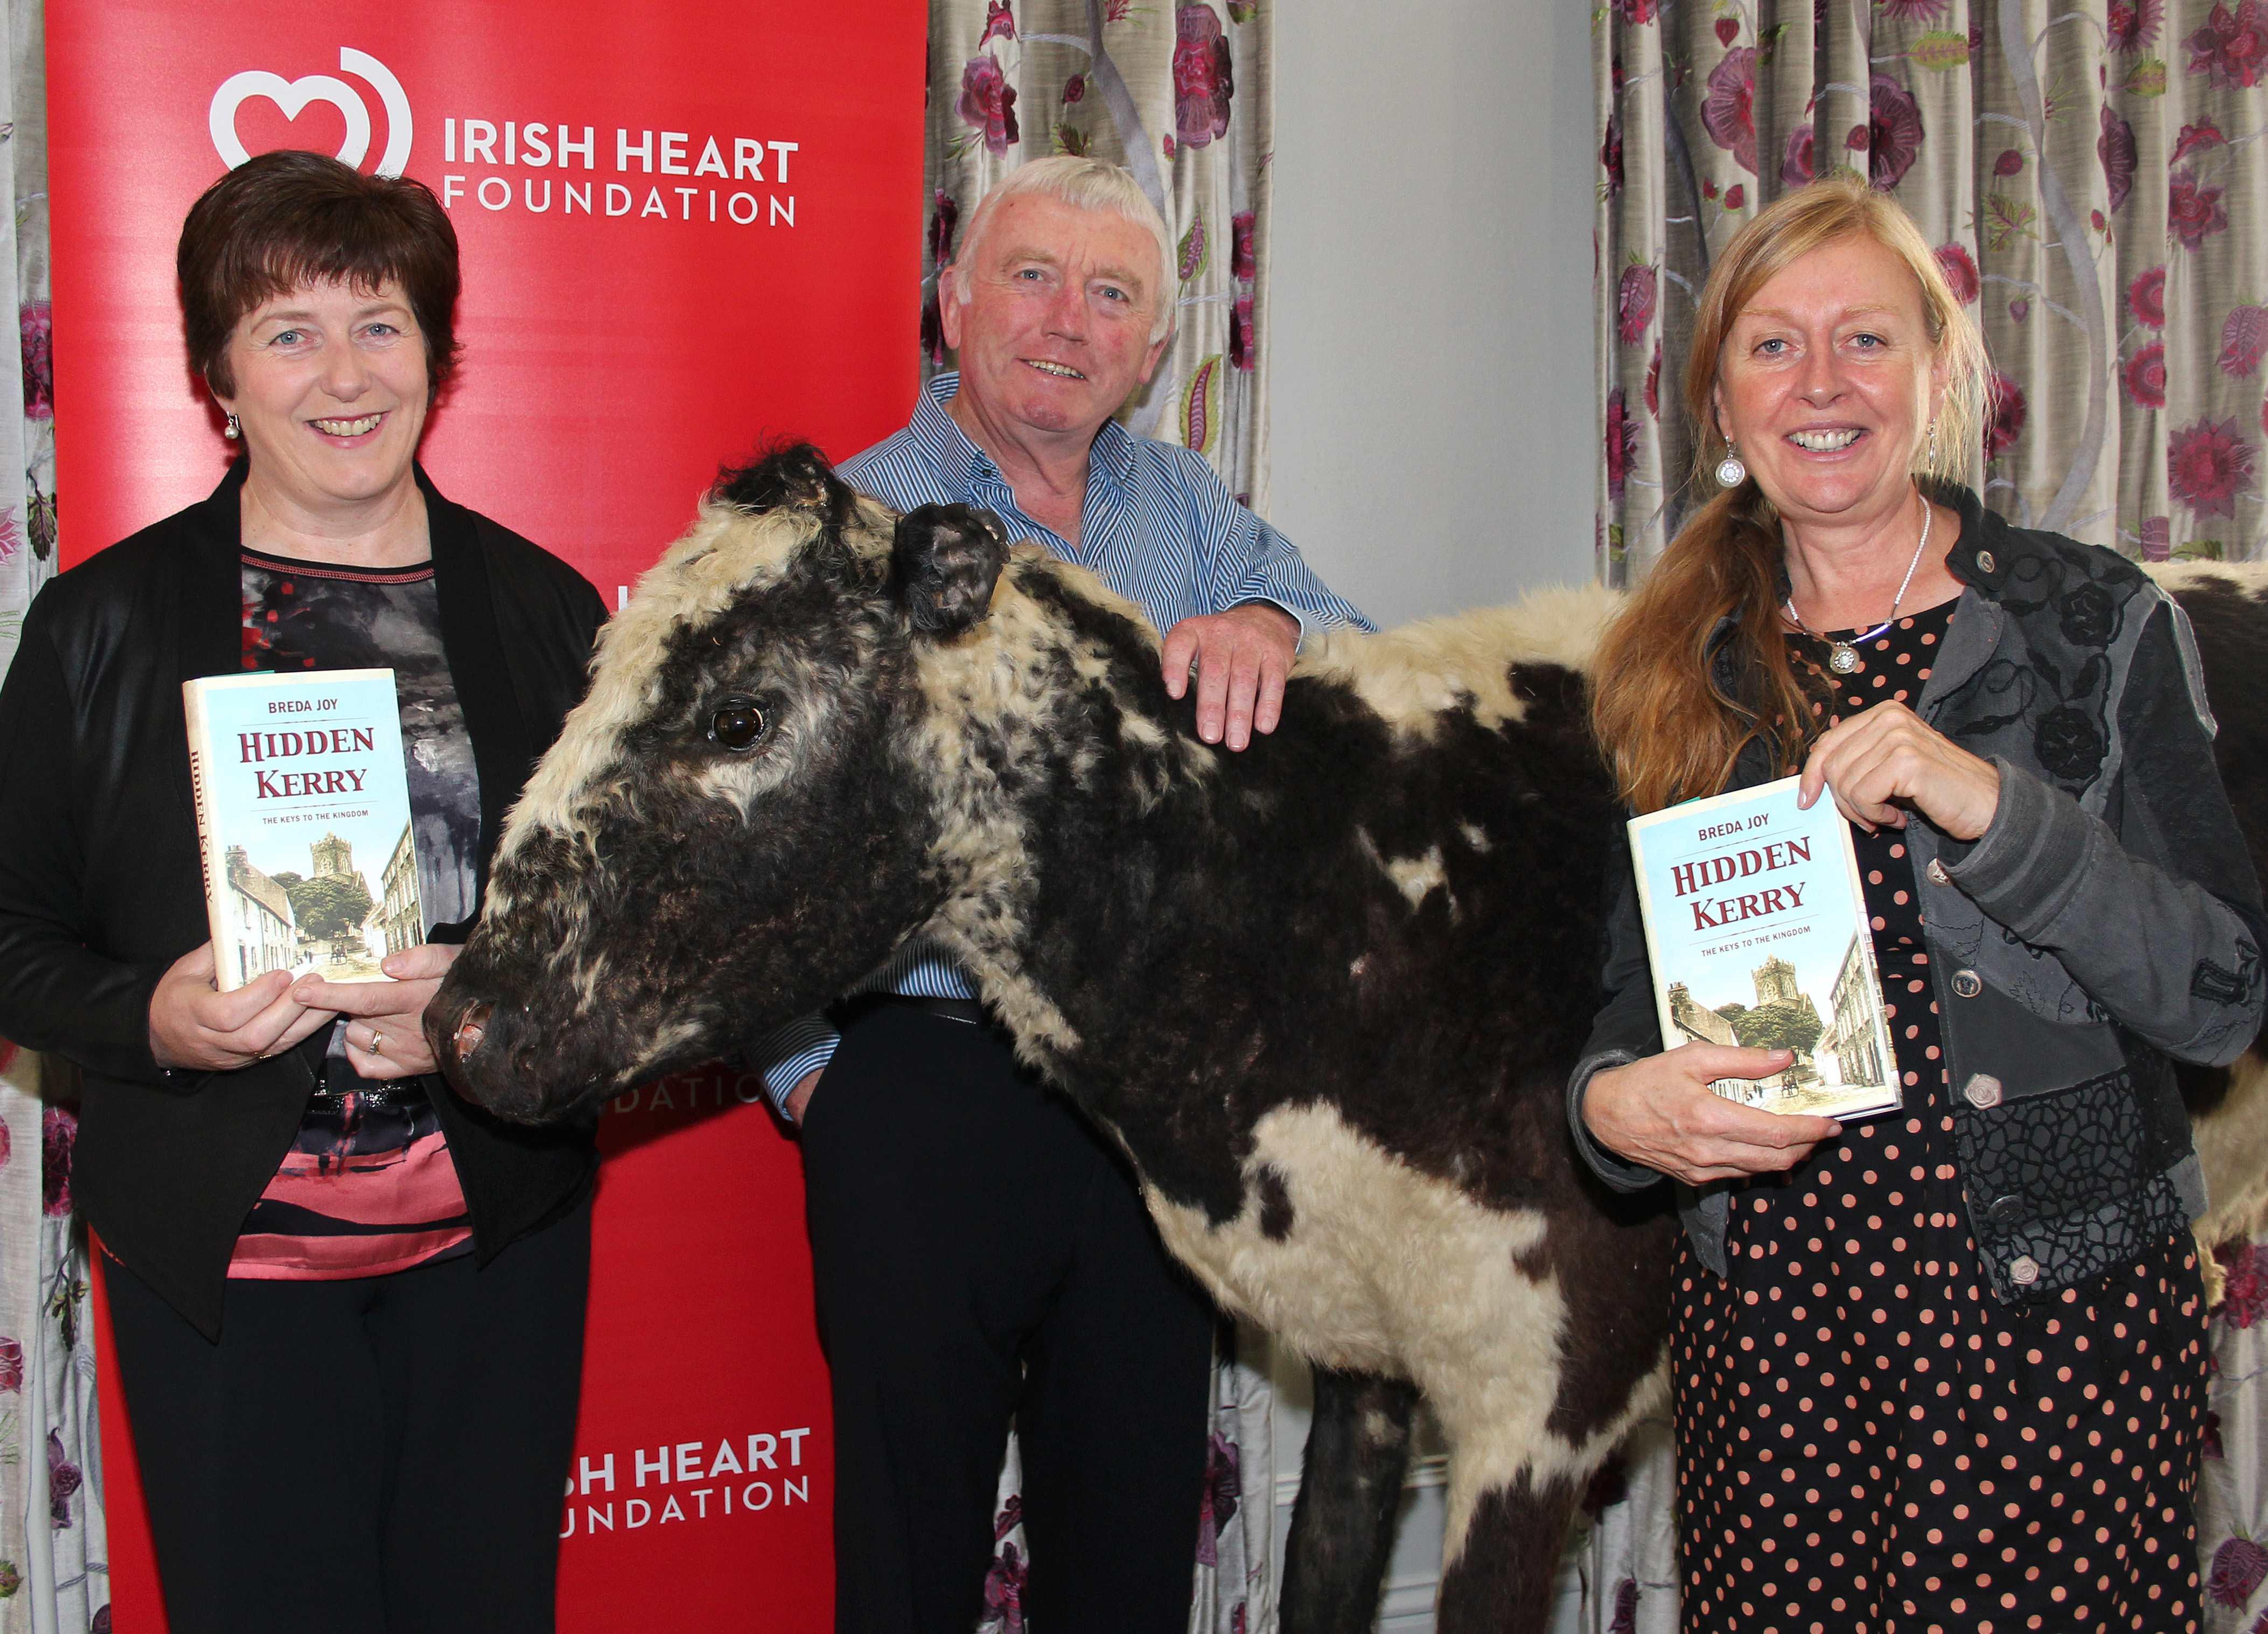 Mary and Teddy O'Neill with Breda Joy & Big Bertha